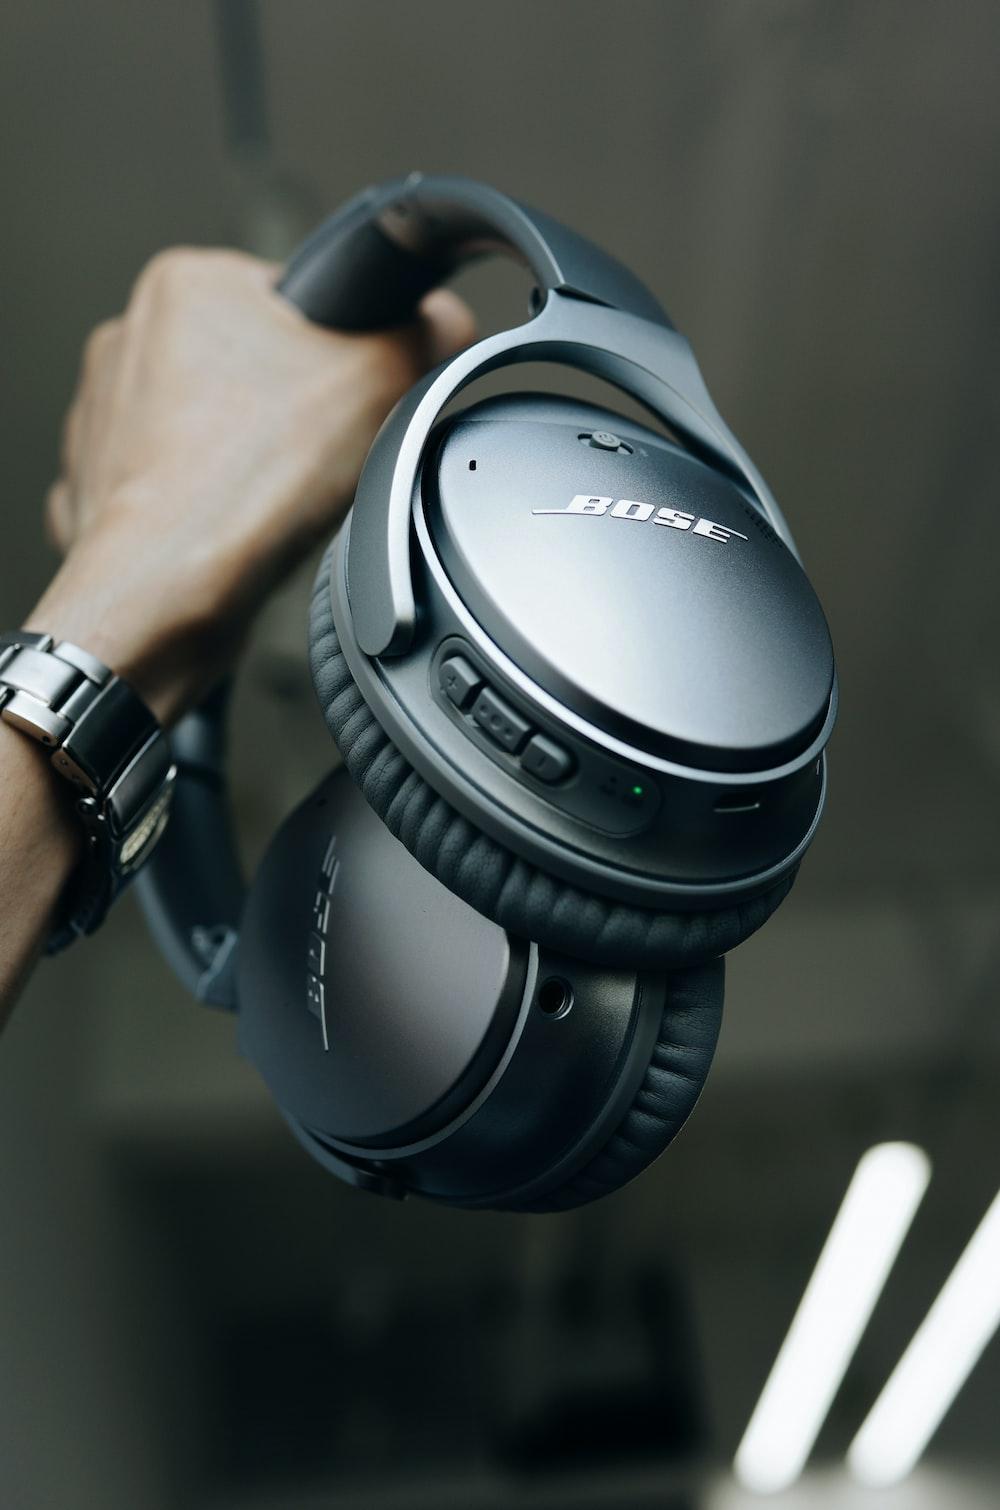 black Bose cordless headphones